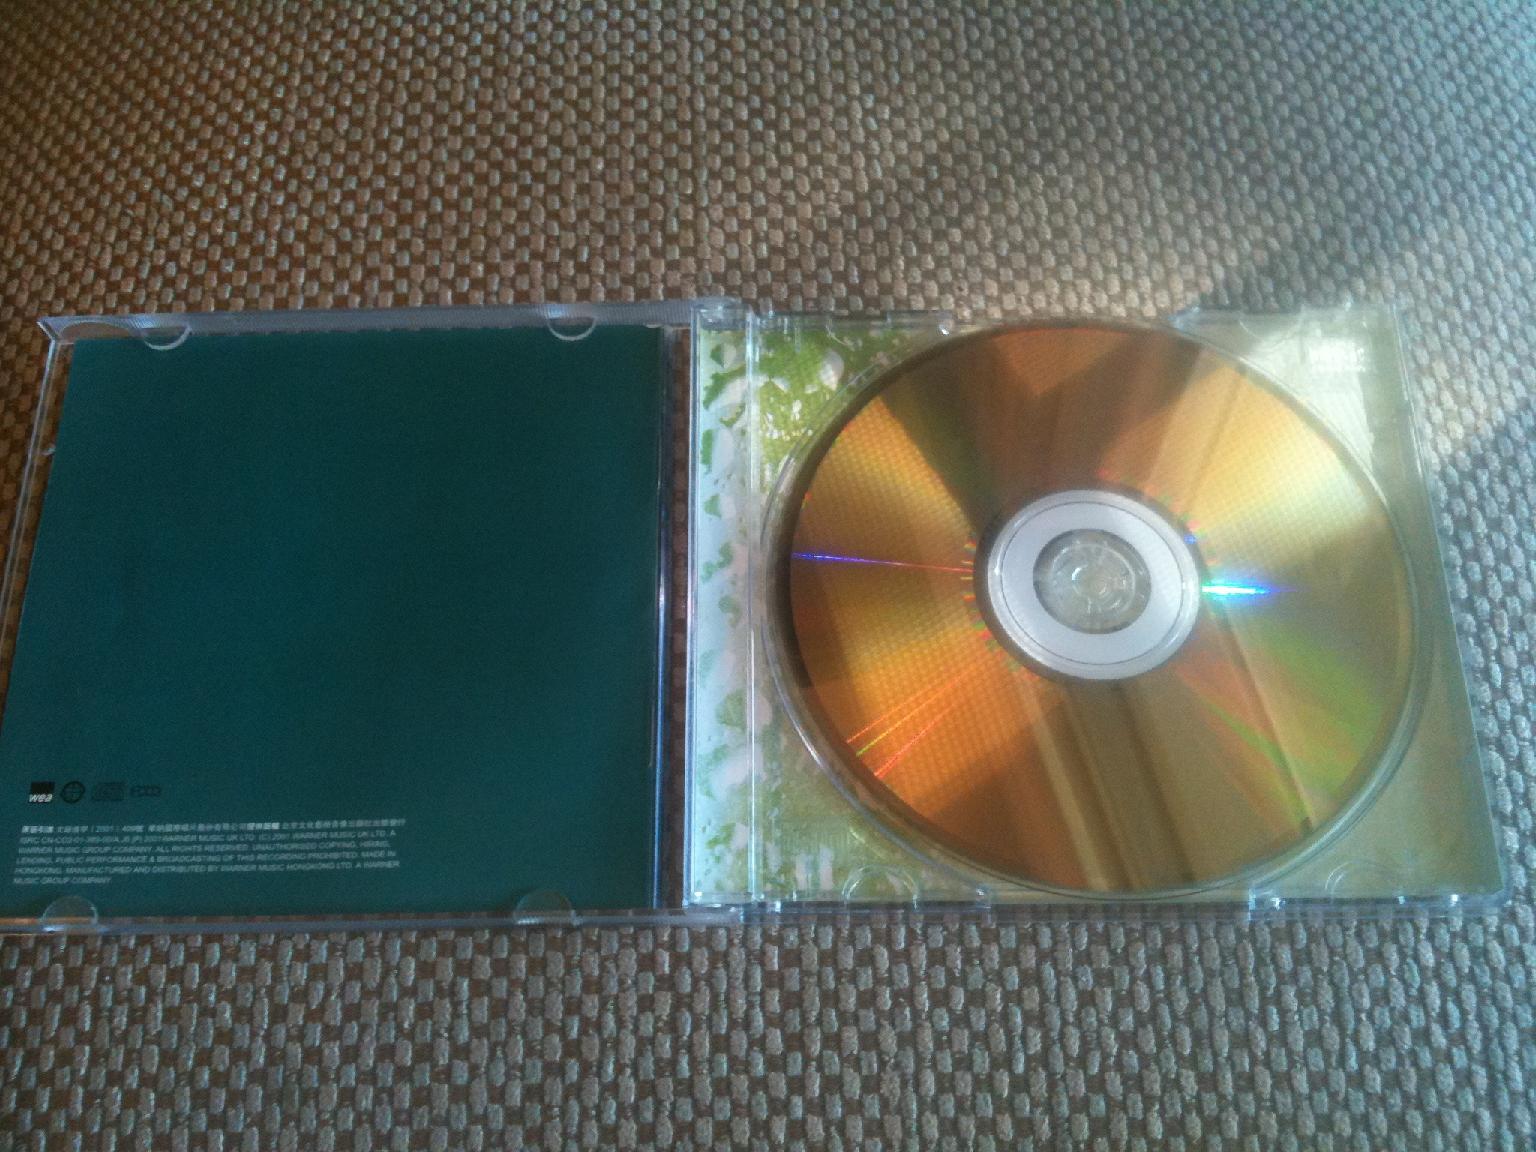 Enya CDs 201.JPG